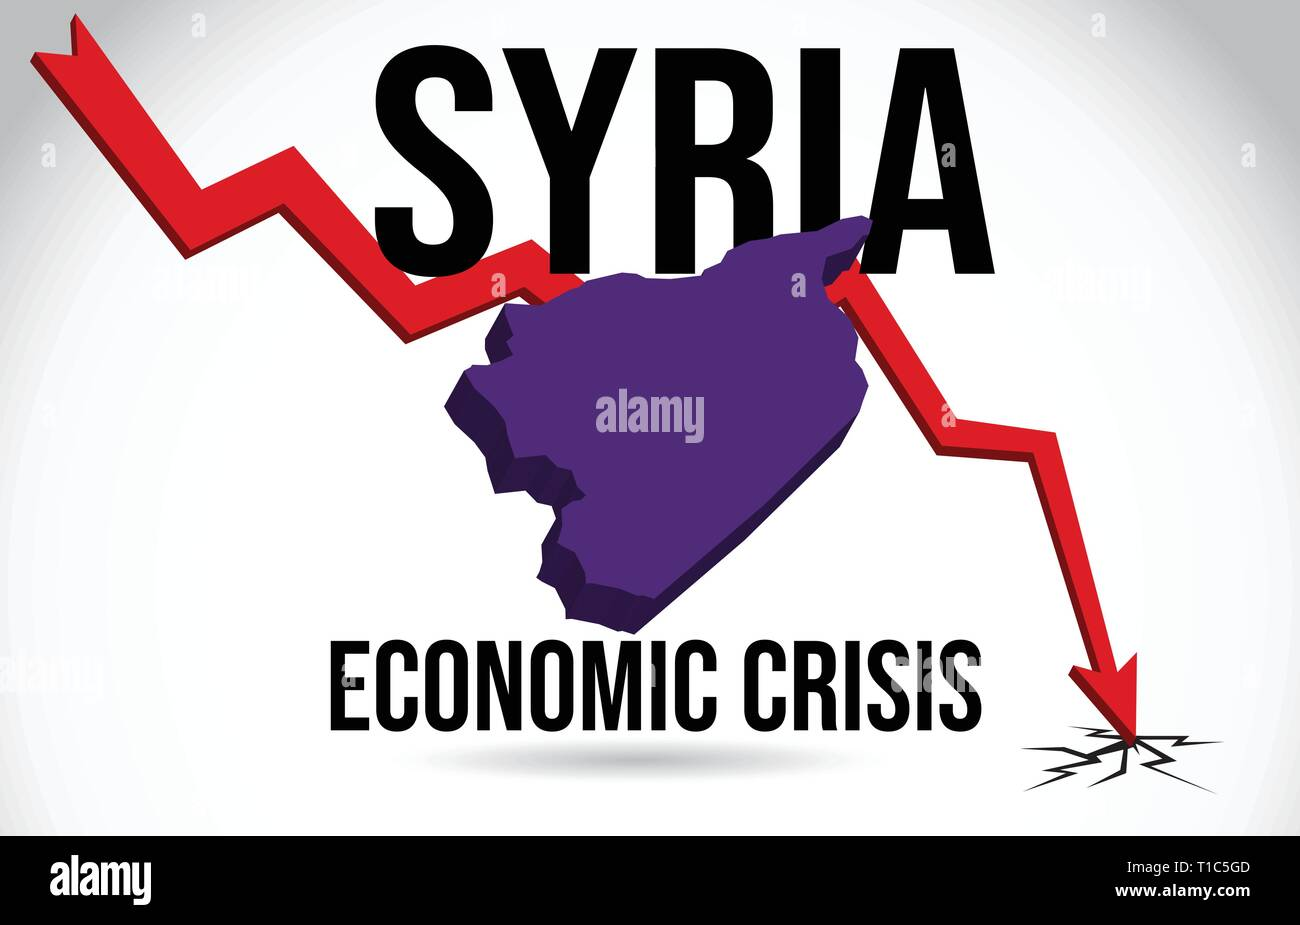 Syria Map Financial Crisis Economic Collapse Market Crash Global Meltdown Vector Illustration. - Stock Vector